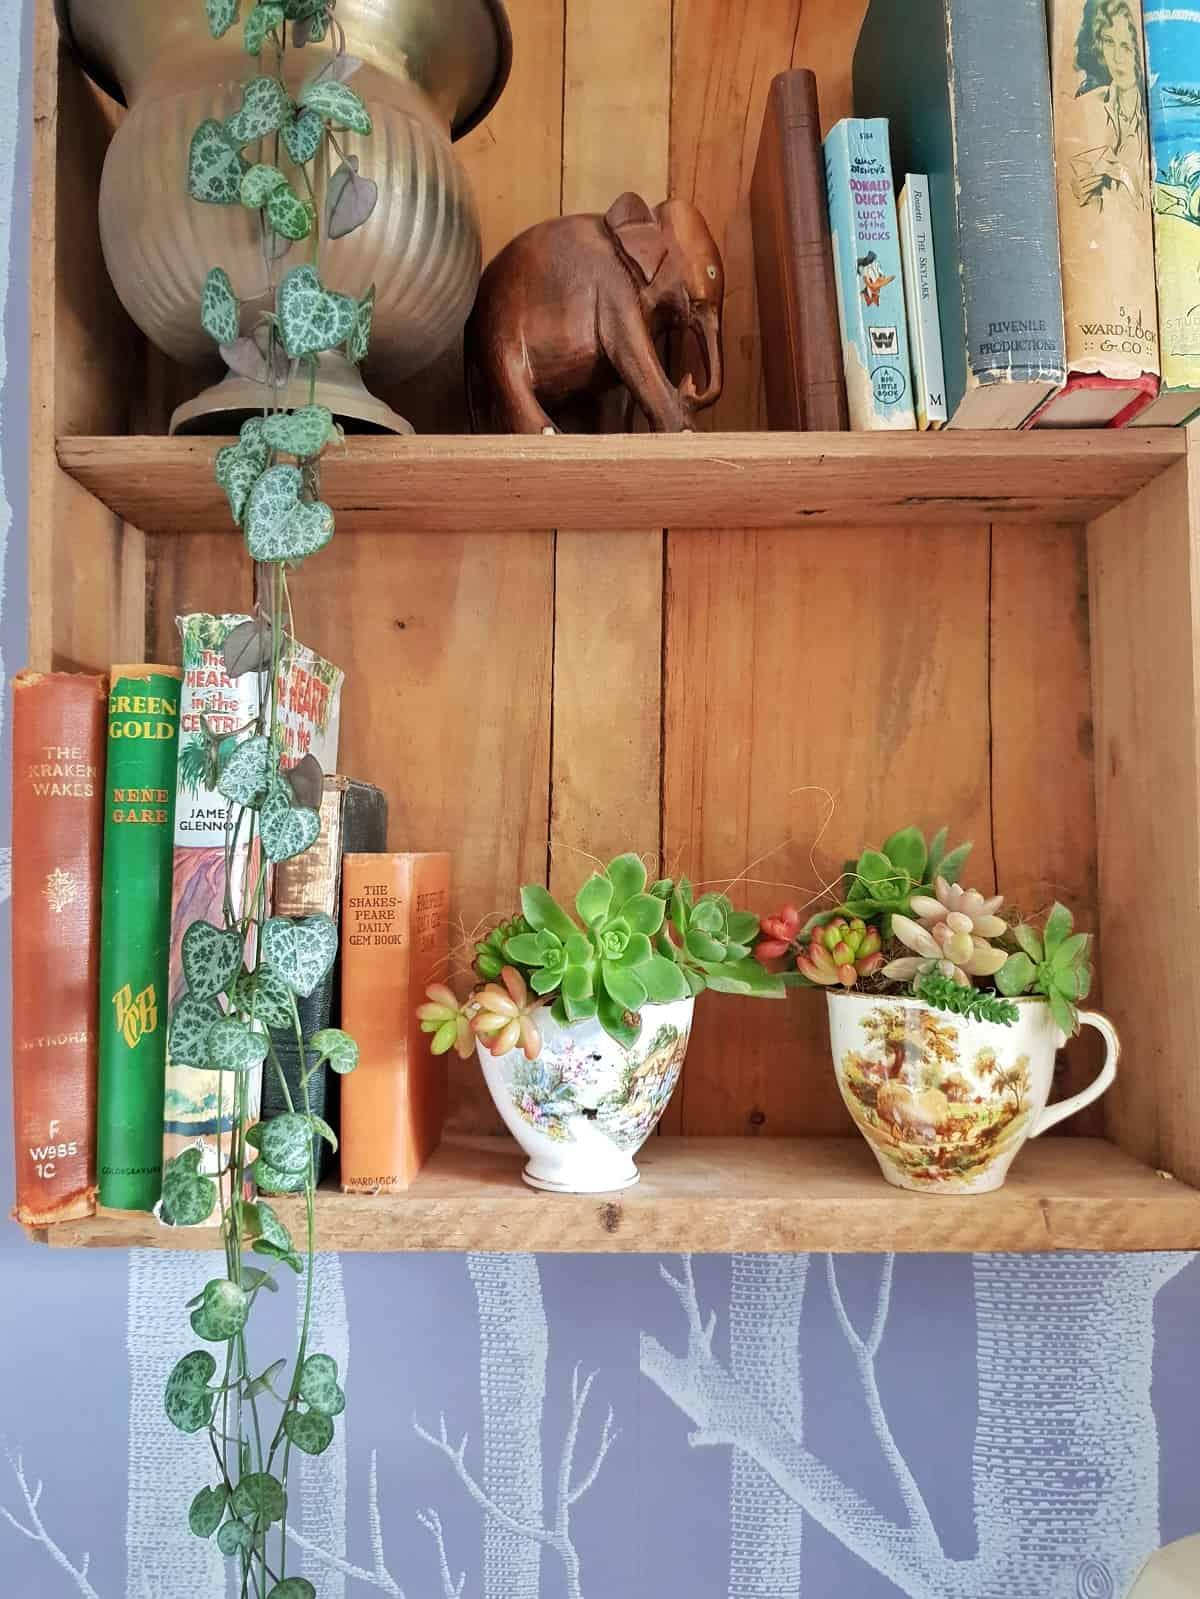 Mini succulent gardens in teacups